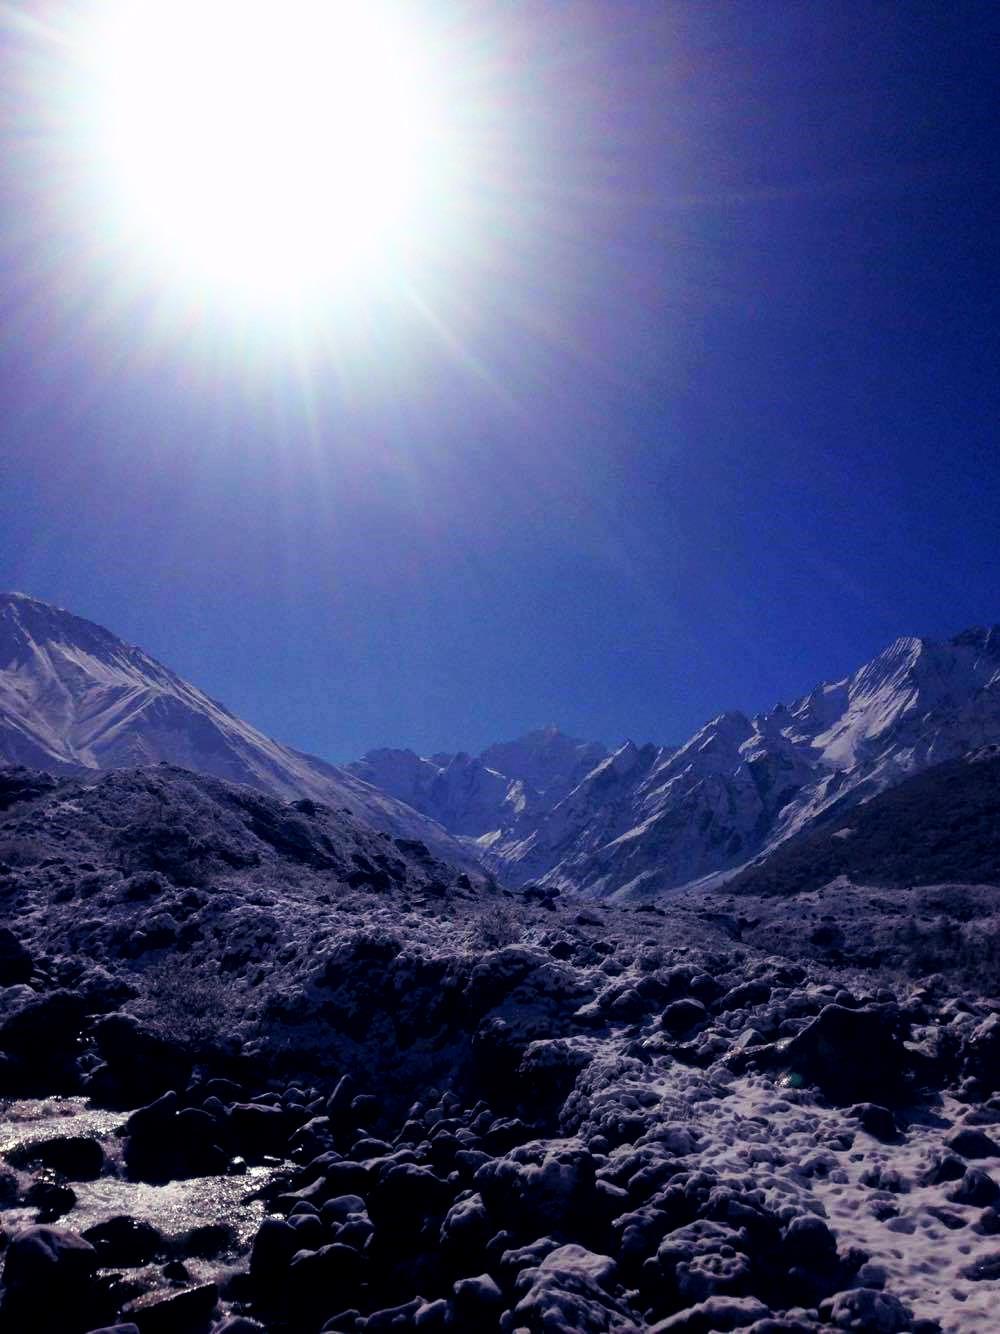 Langtang_Sun_is_shining_April_2016_Adventure_Alternative_Nepal.jpg